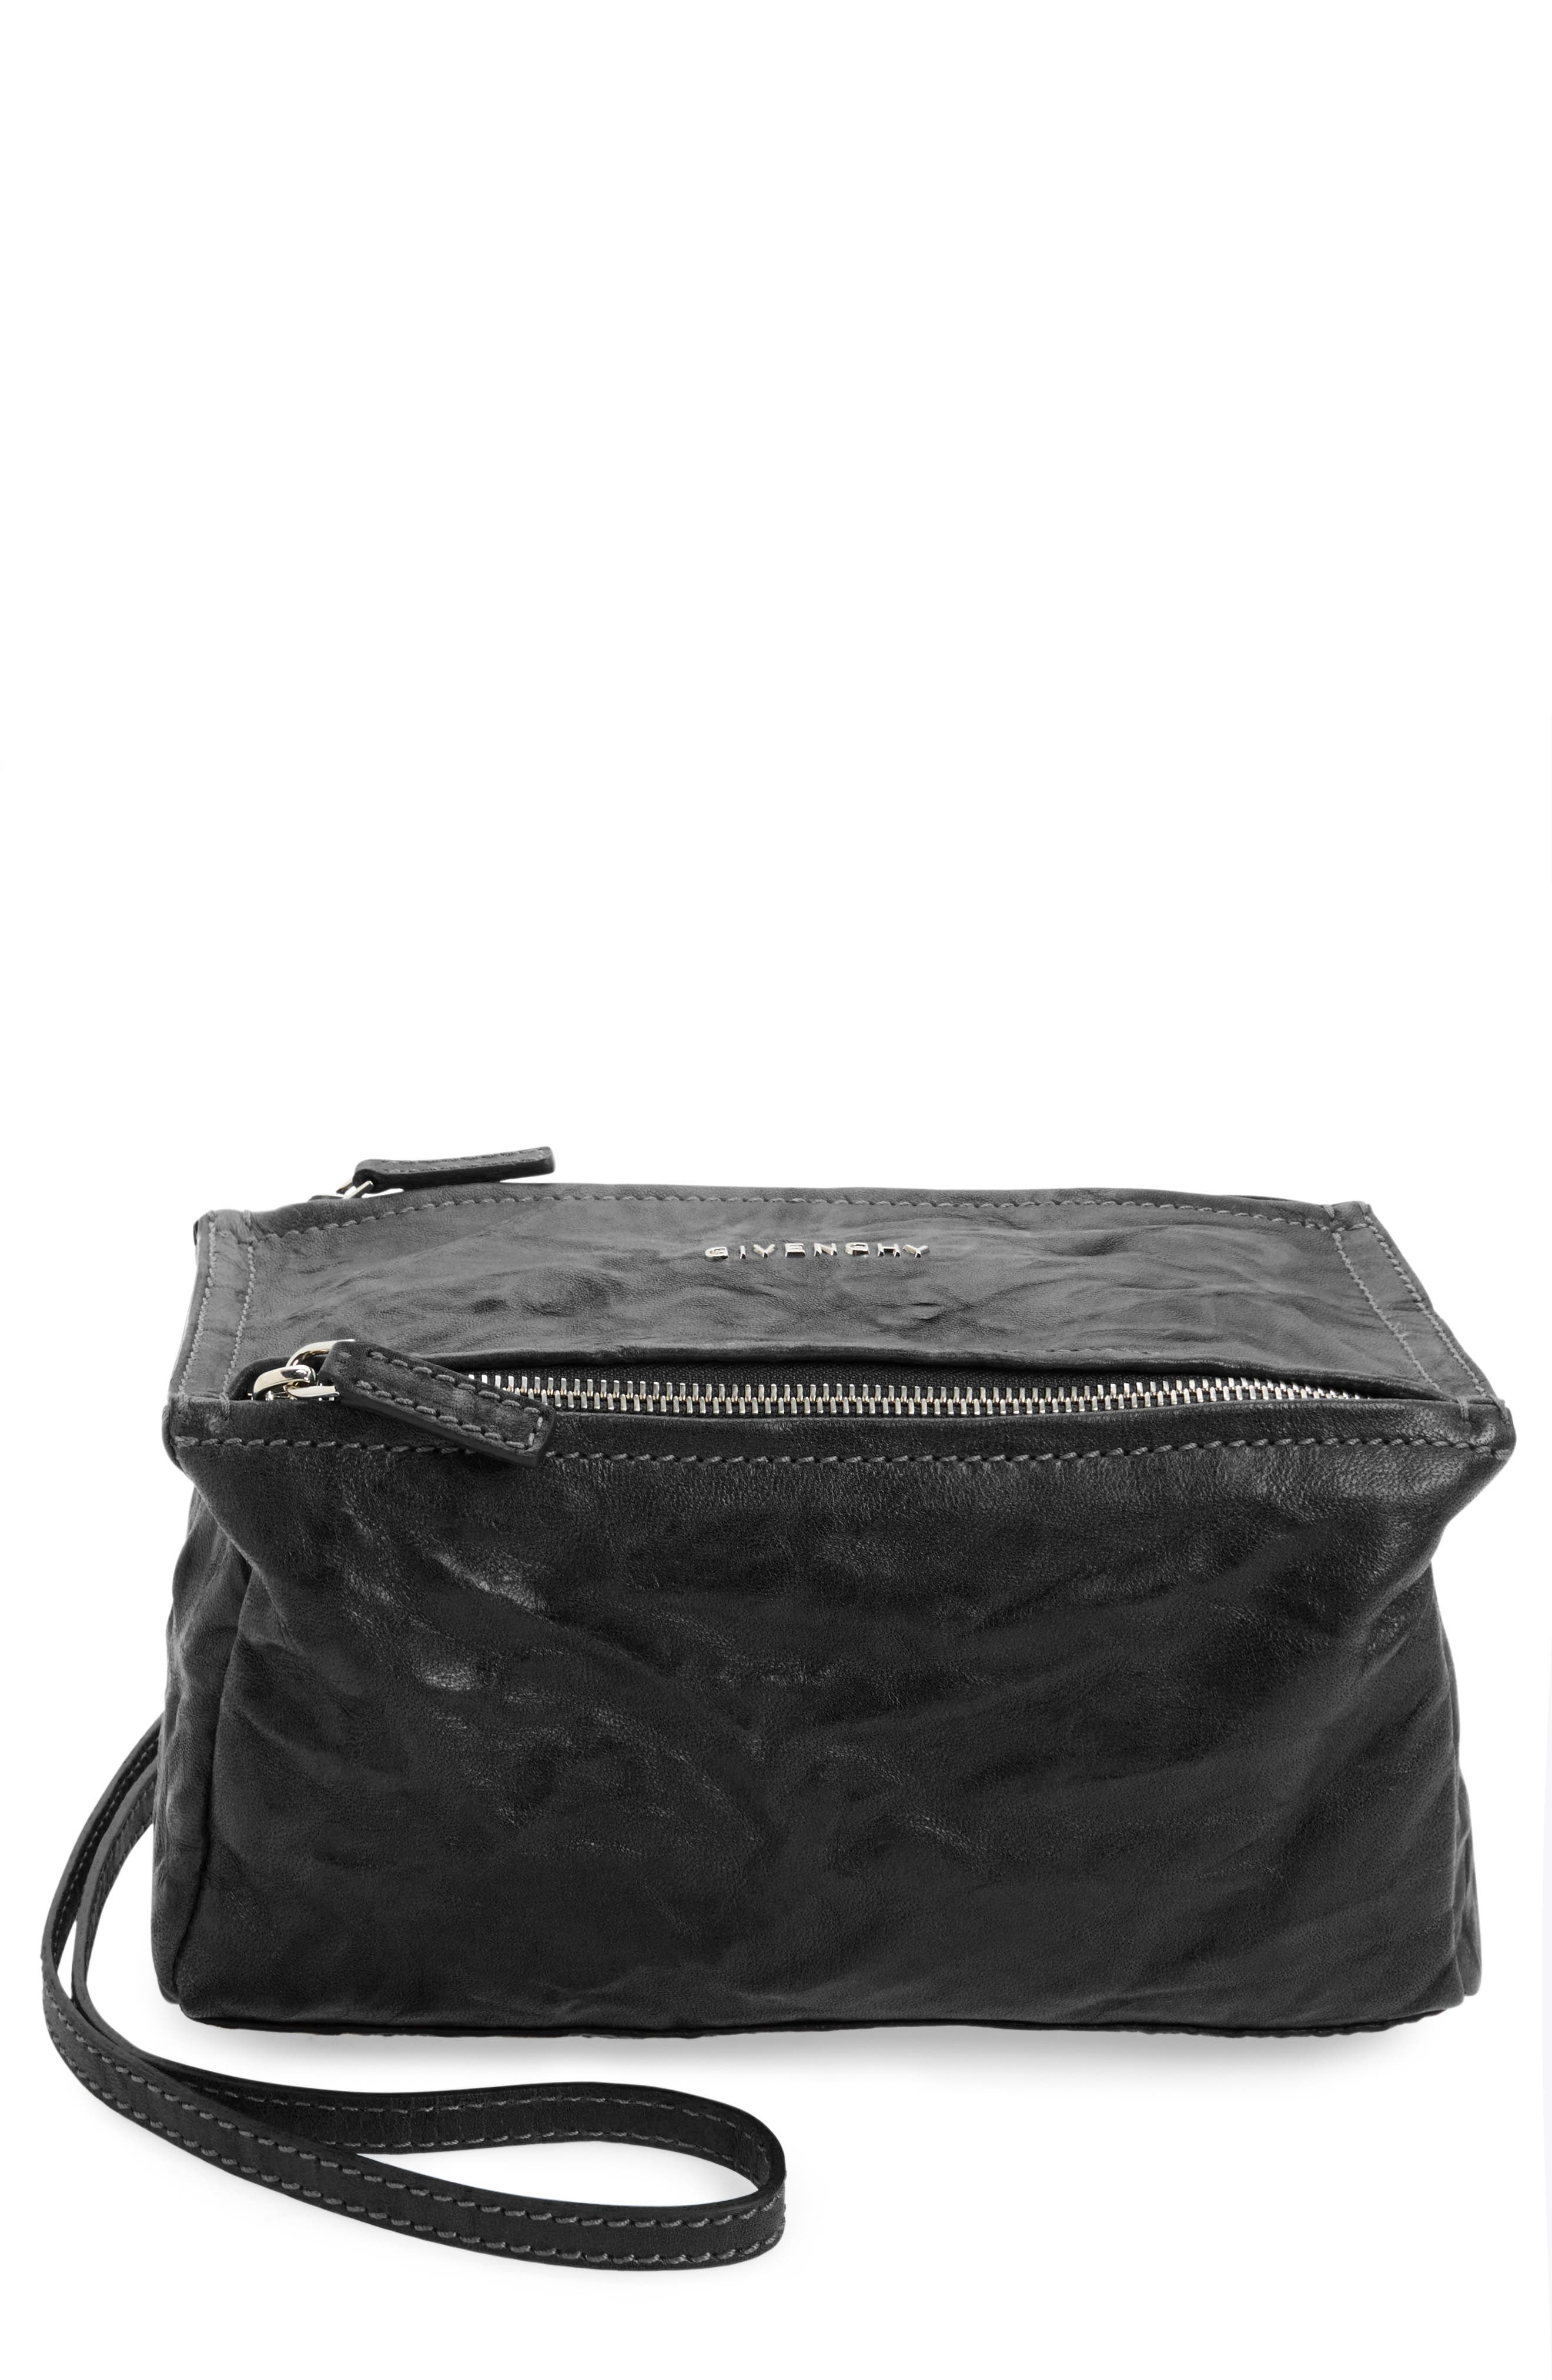 Givenchy  Mini Pepe Pandora  Leather Shoulder Bag - f5e0b33d76